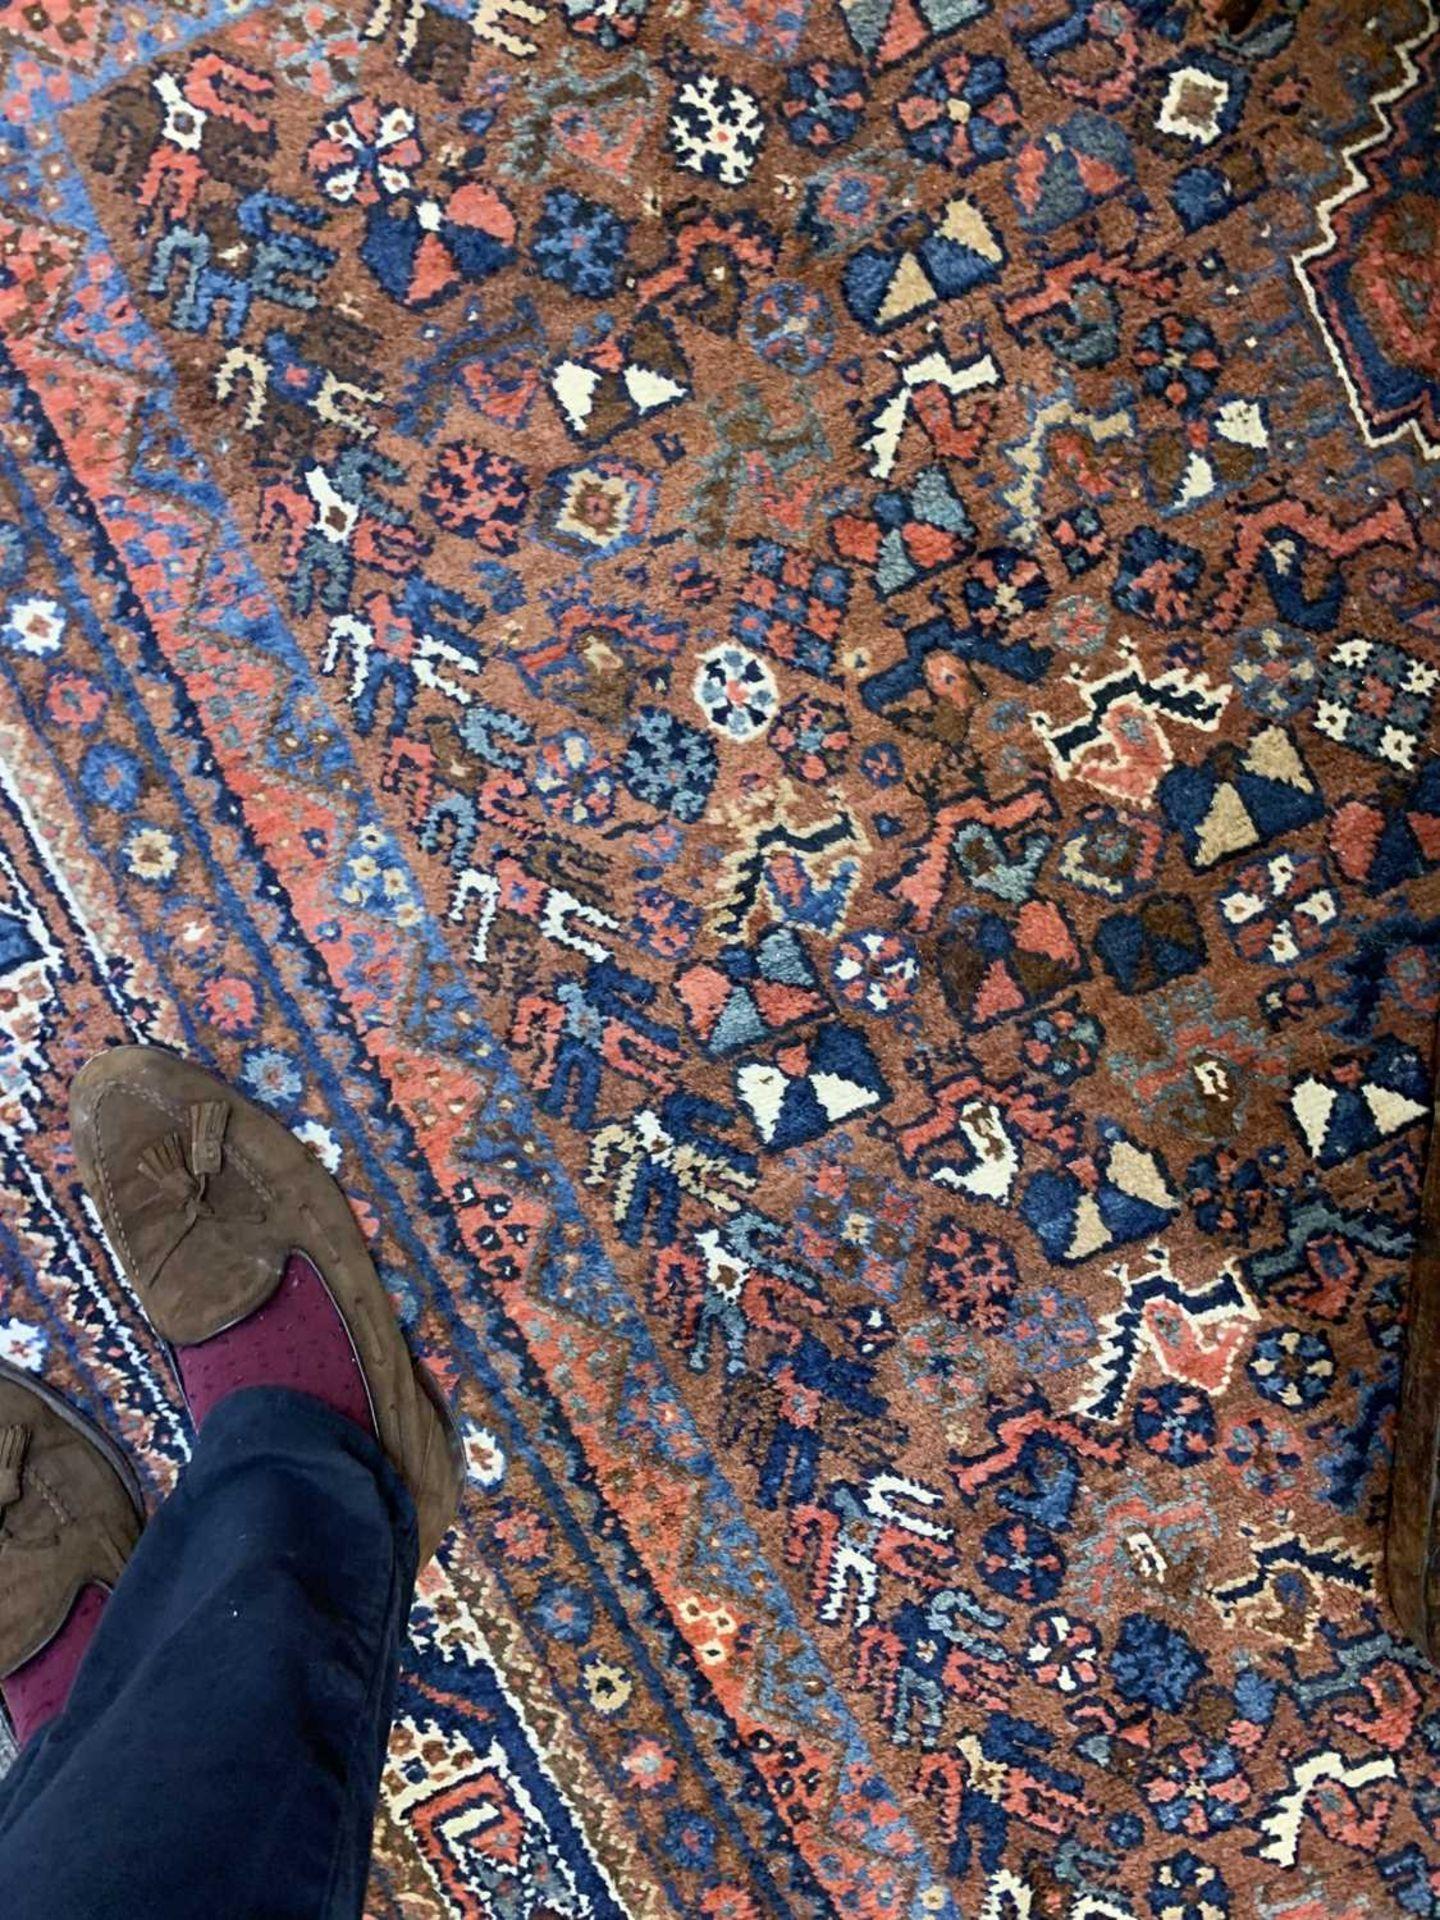 A South West Persian Khamseh carpet, - Image 7 of 17